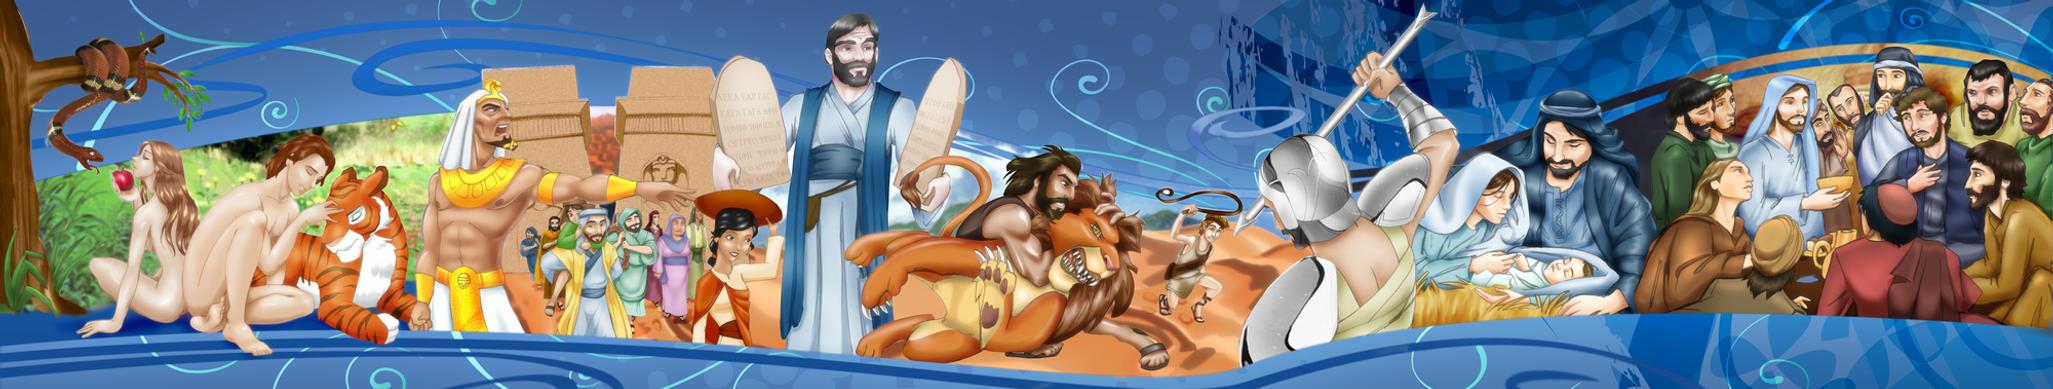 biblia by Ericorion